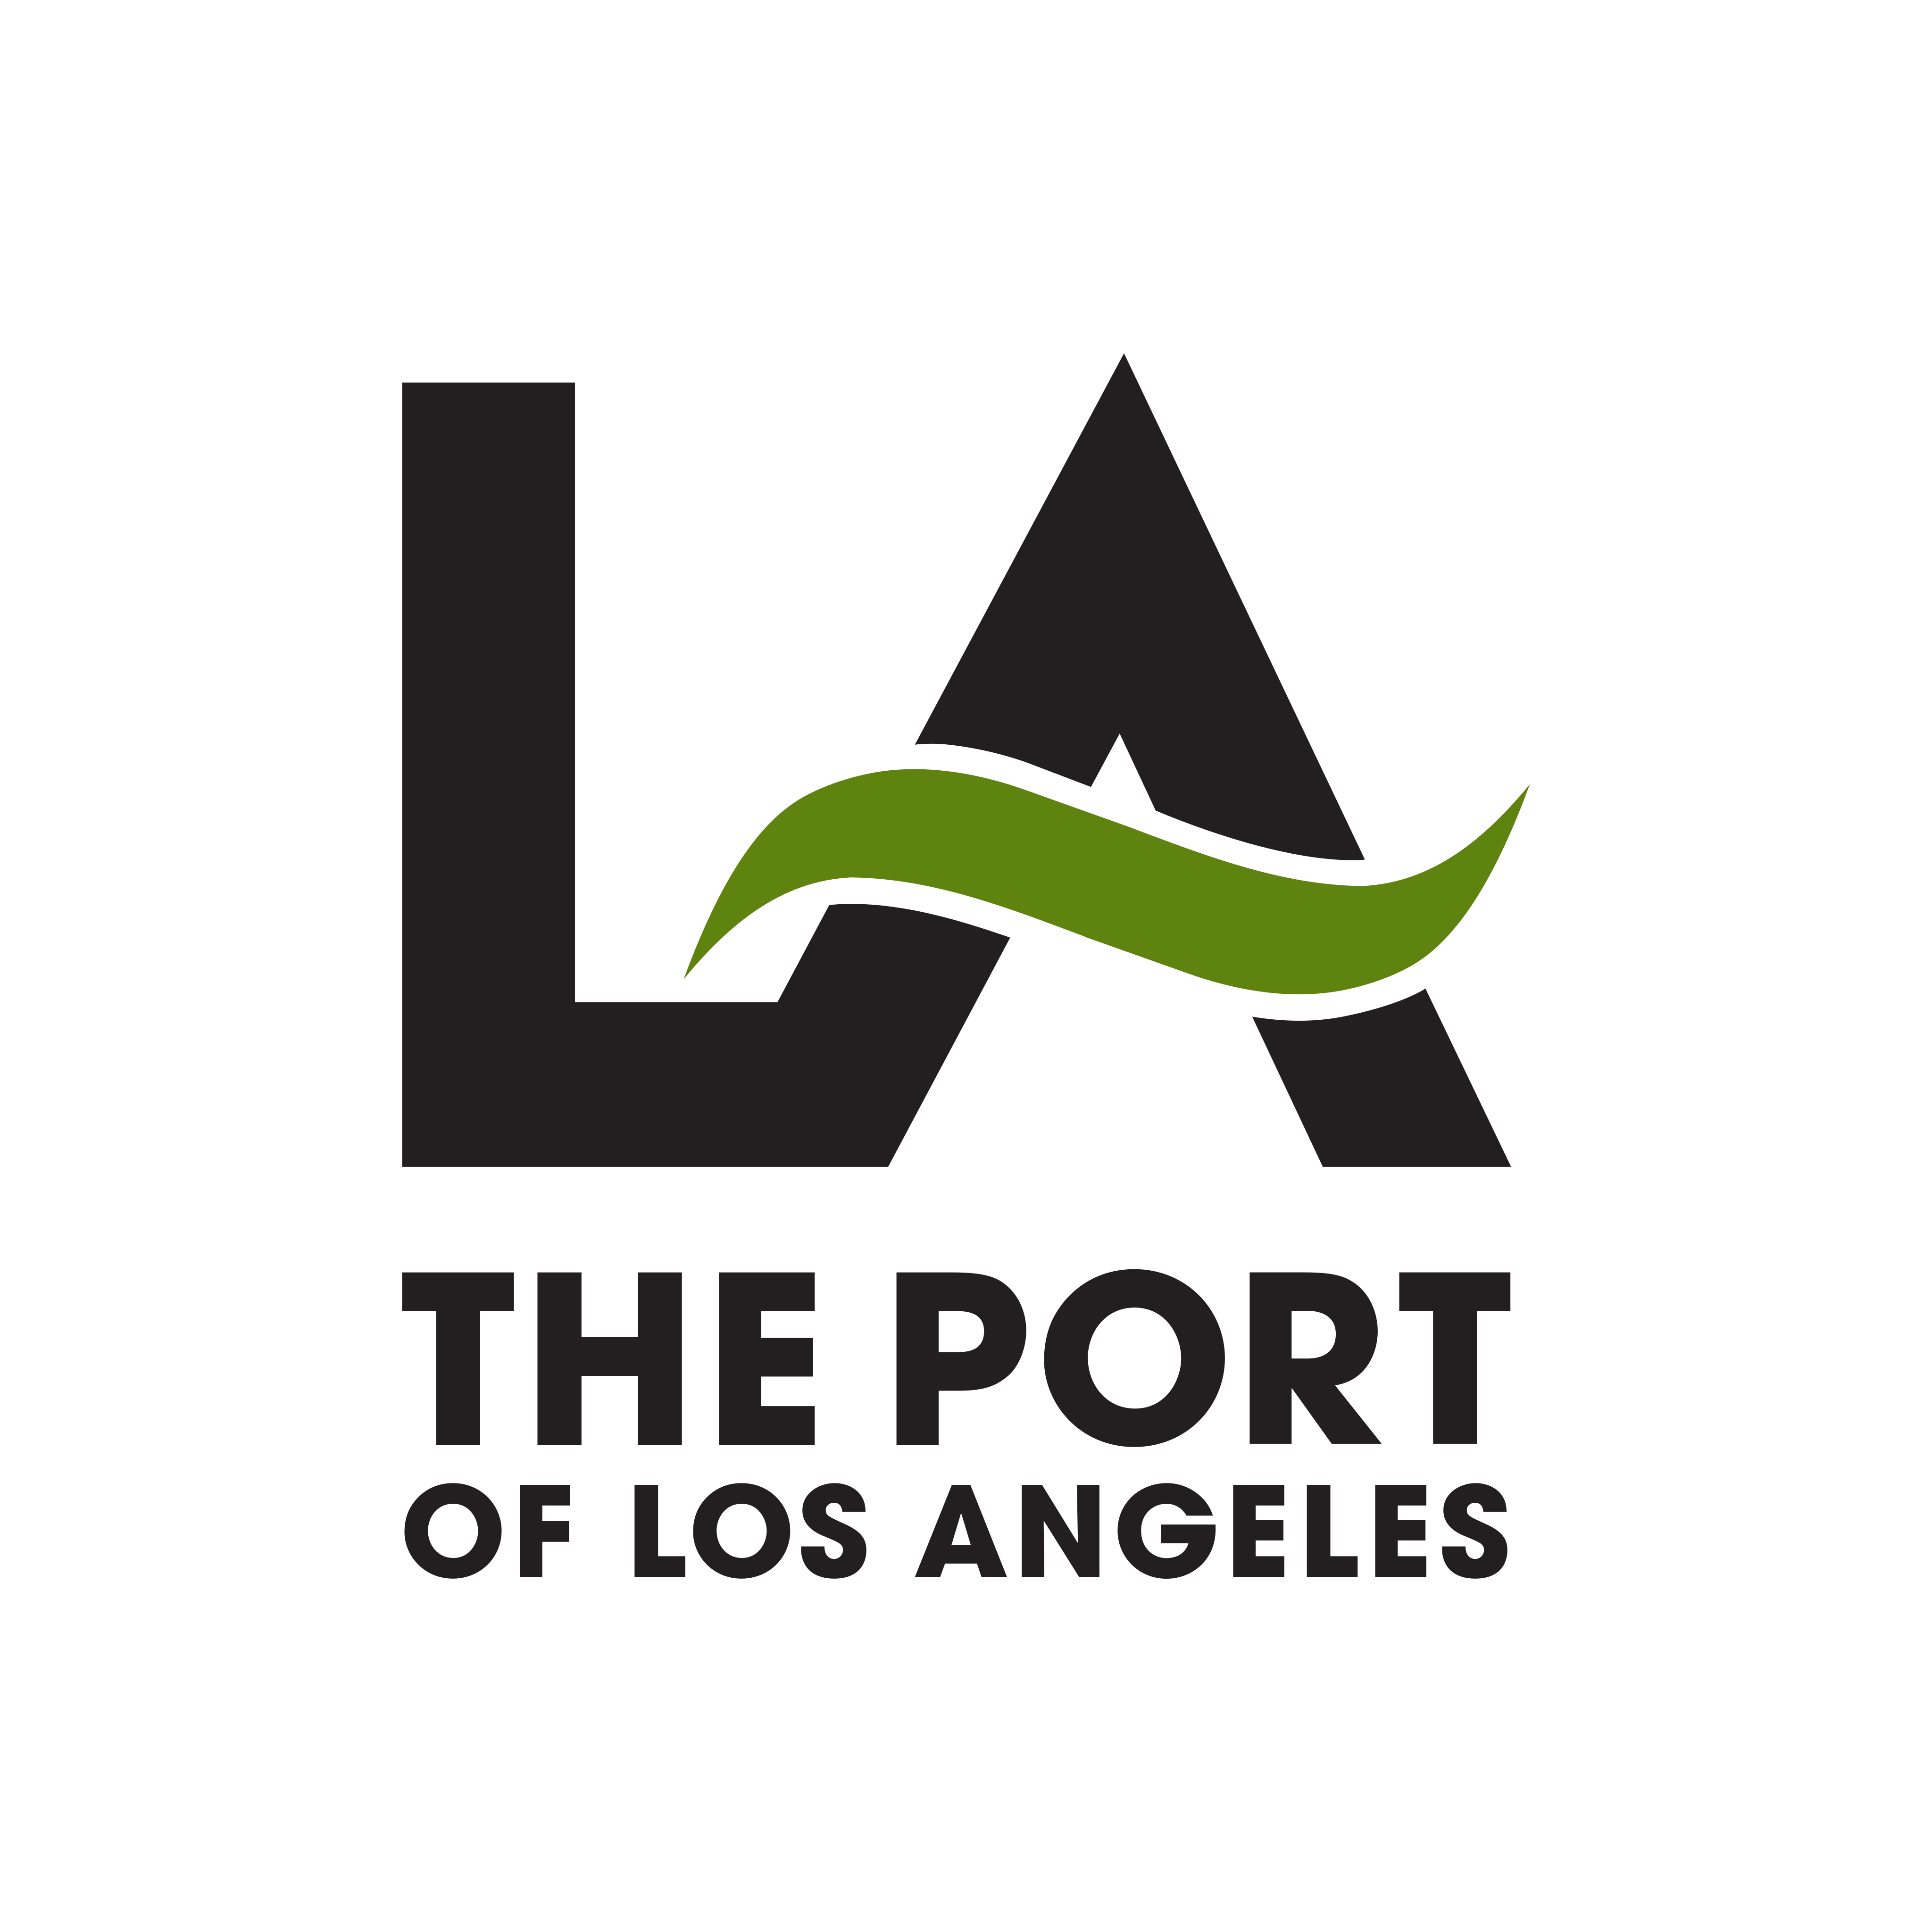 port of los angeles logo 0 - Port of Los Angeles Logo